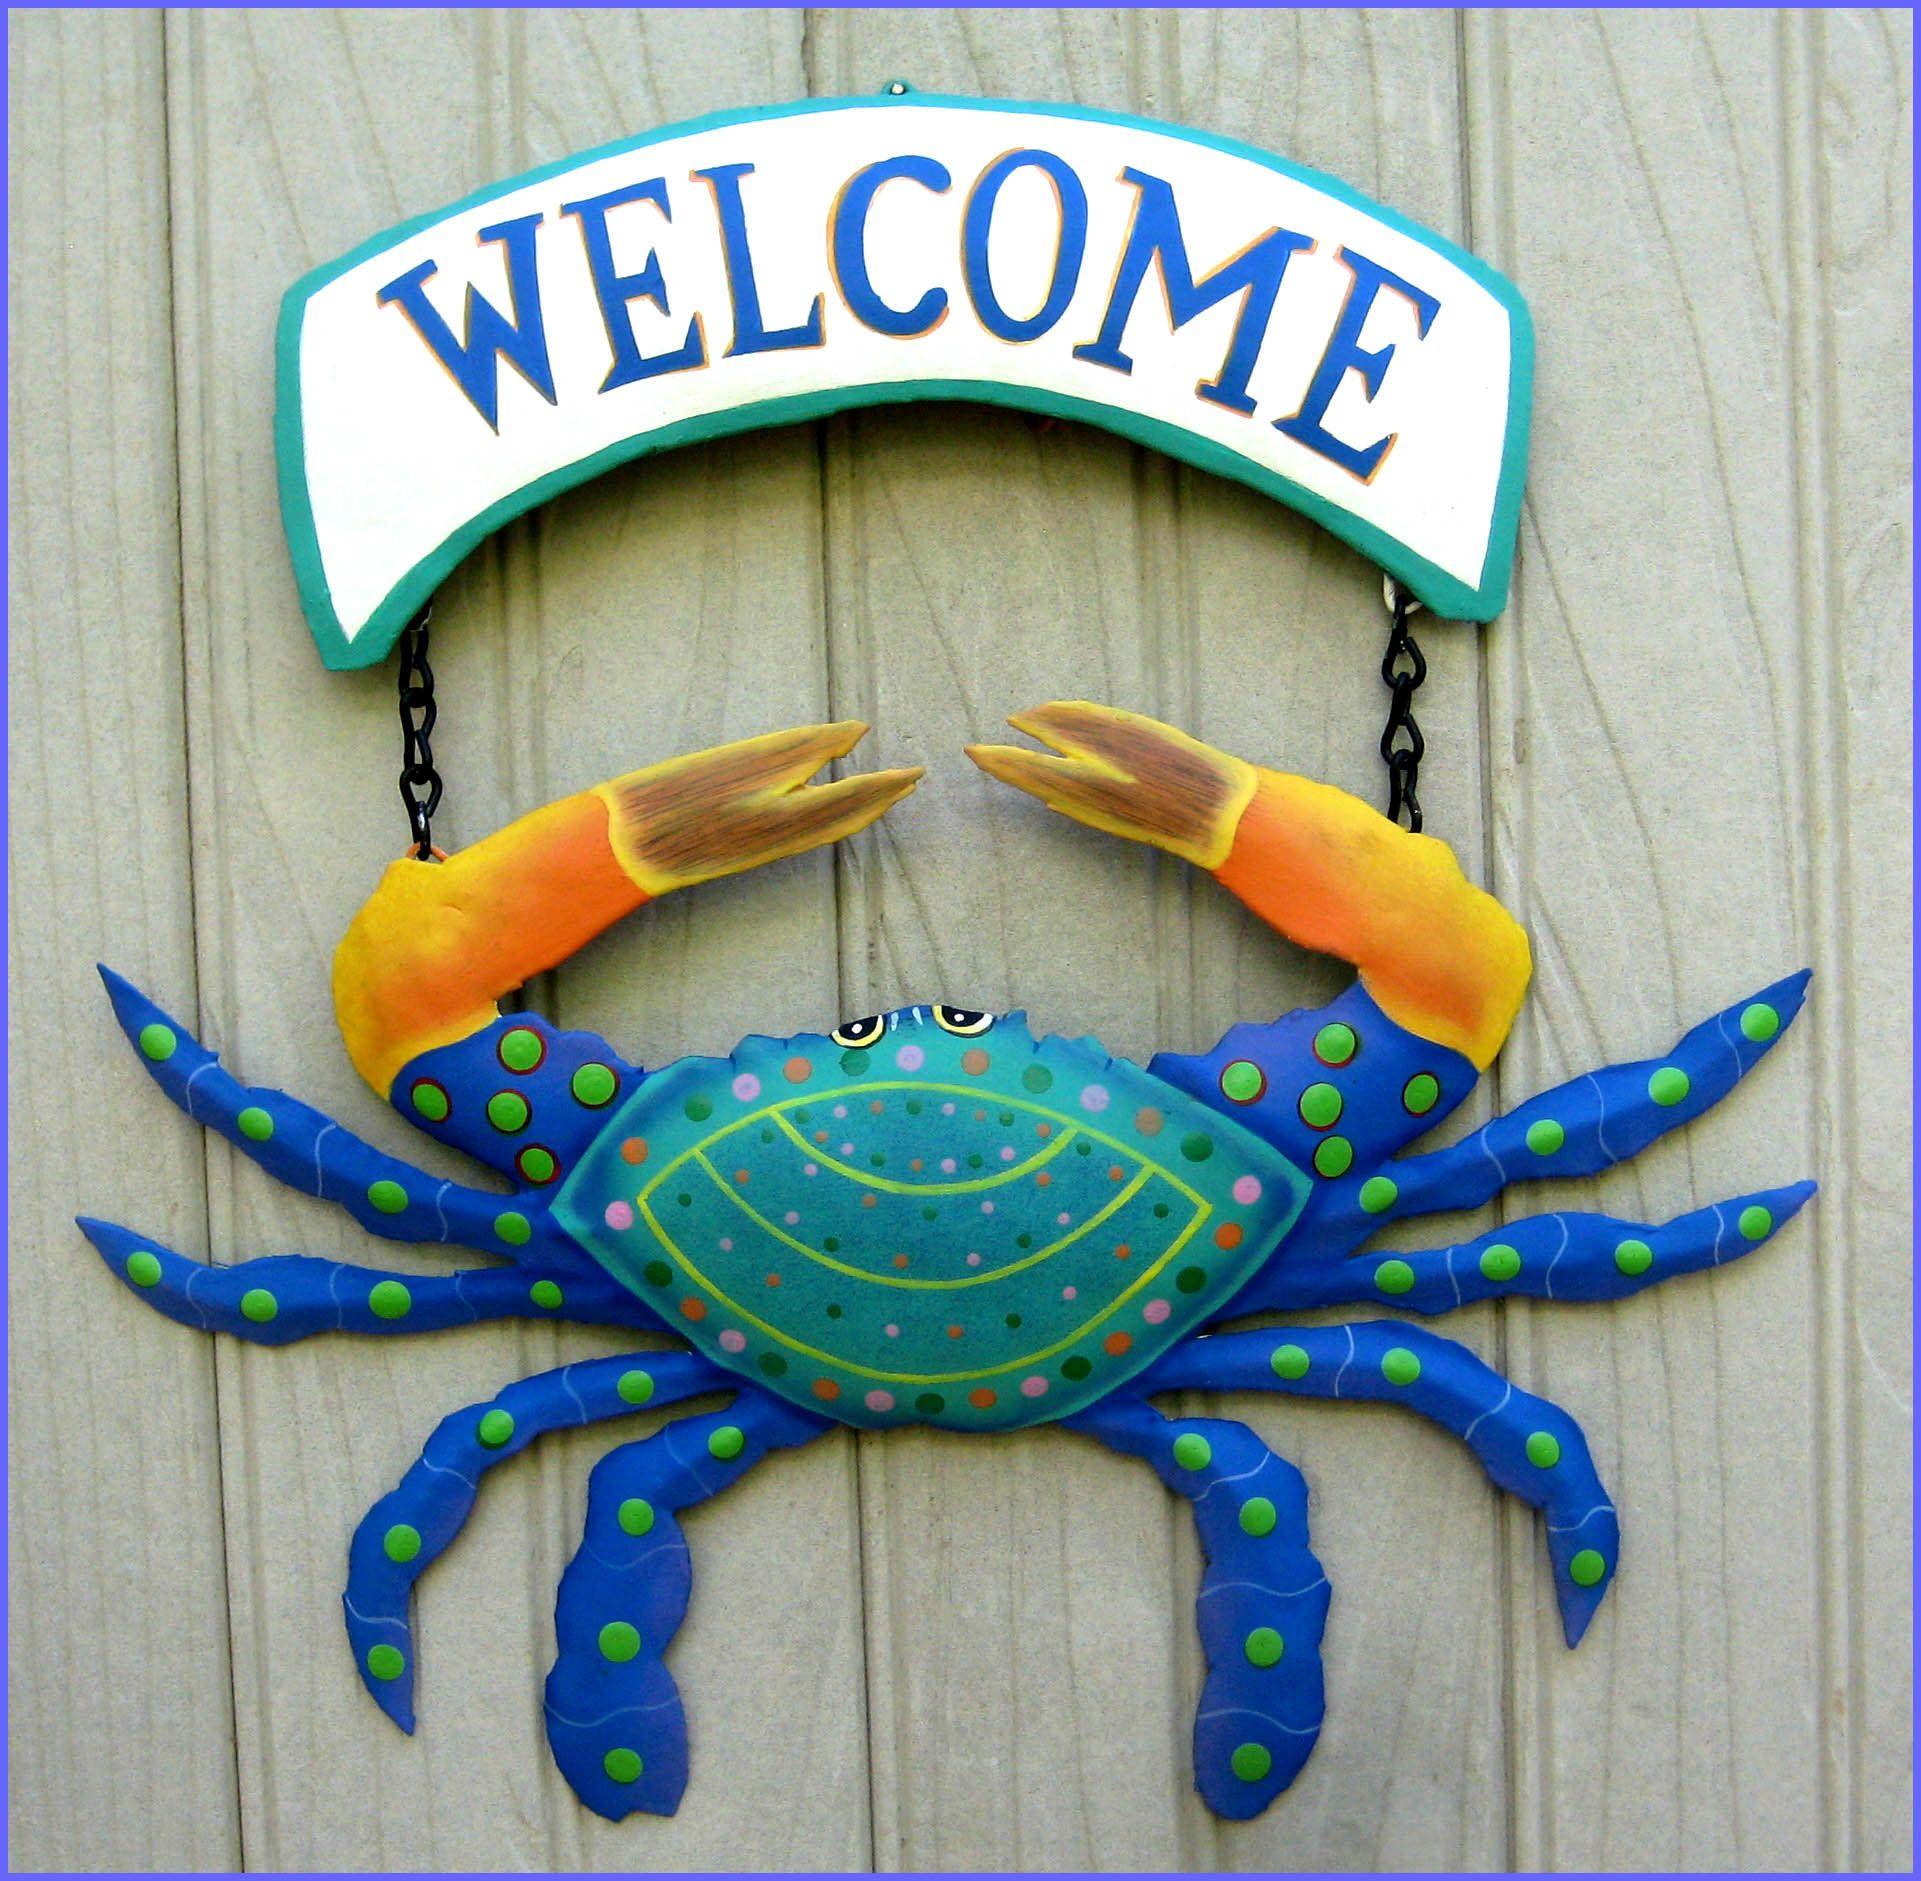 Photo of Blue Crab, Painted Metal Crab, Metal Wall Art, Coastal Metal Welcome Sign, Tropical Decor, Beach Decor, Island Decor, Garden Decor, 107TB-CW